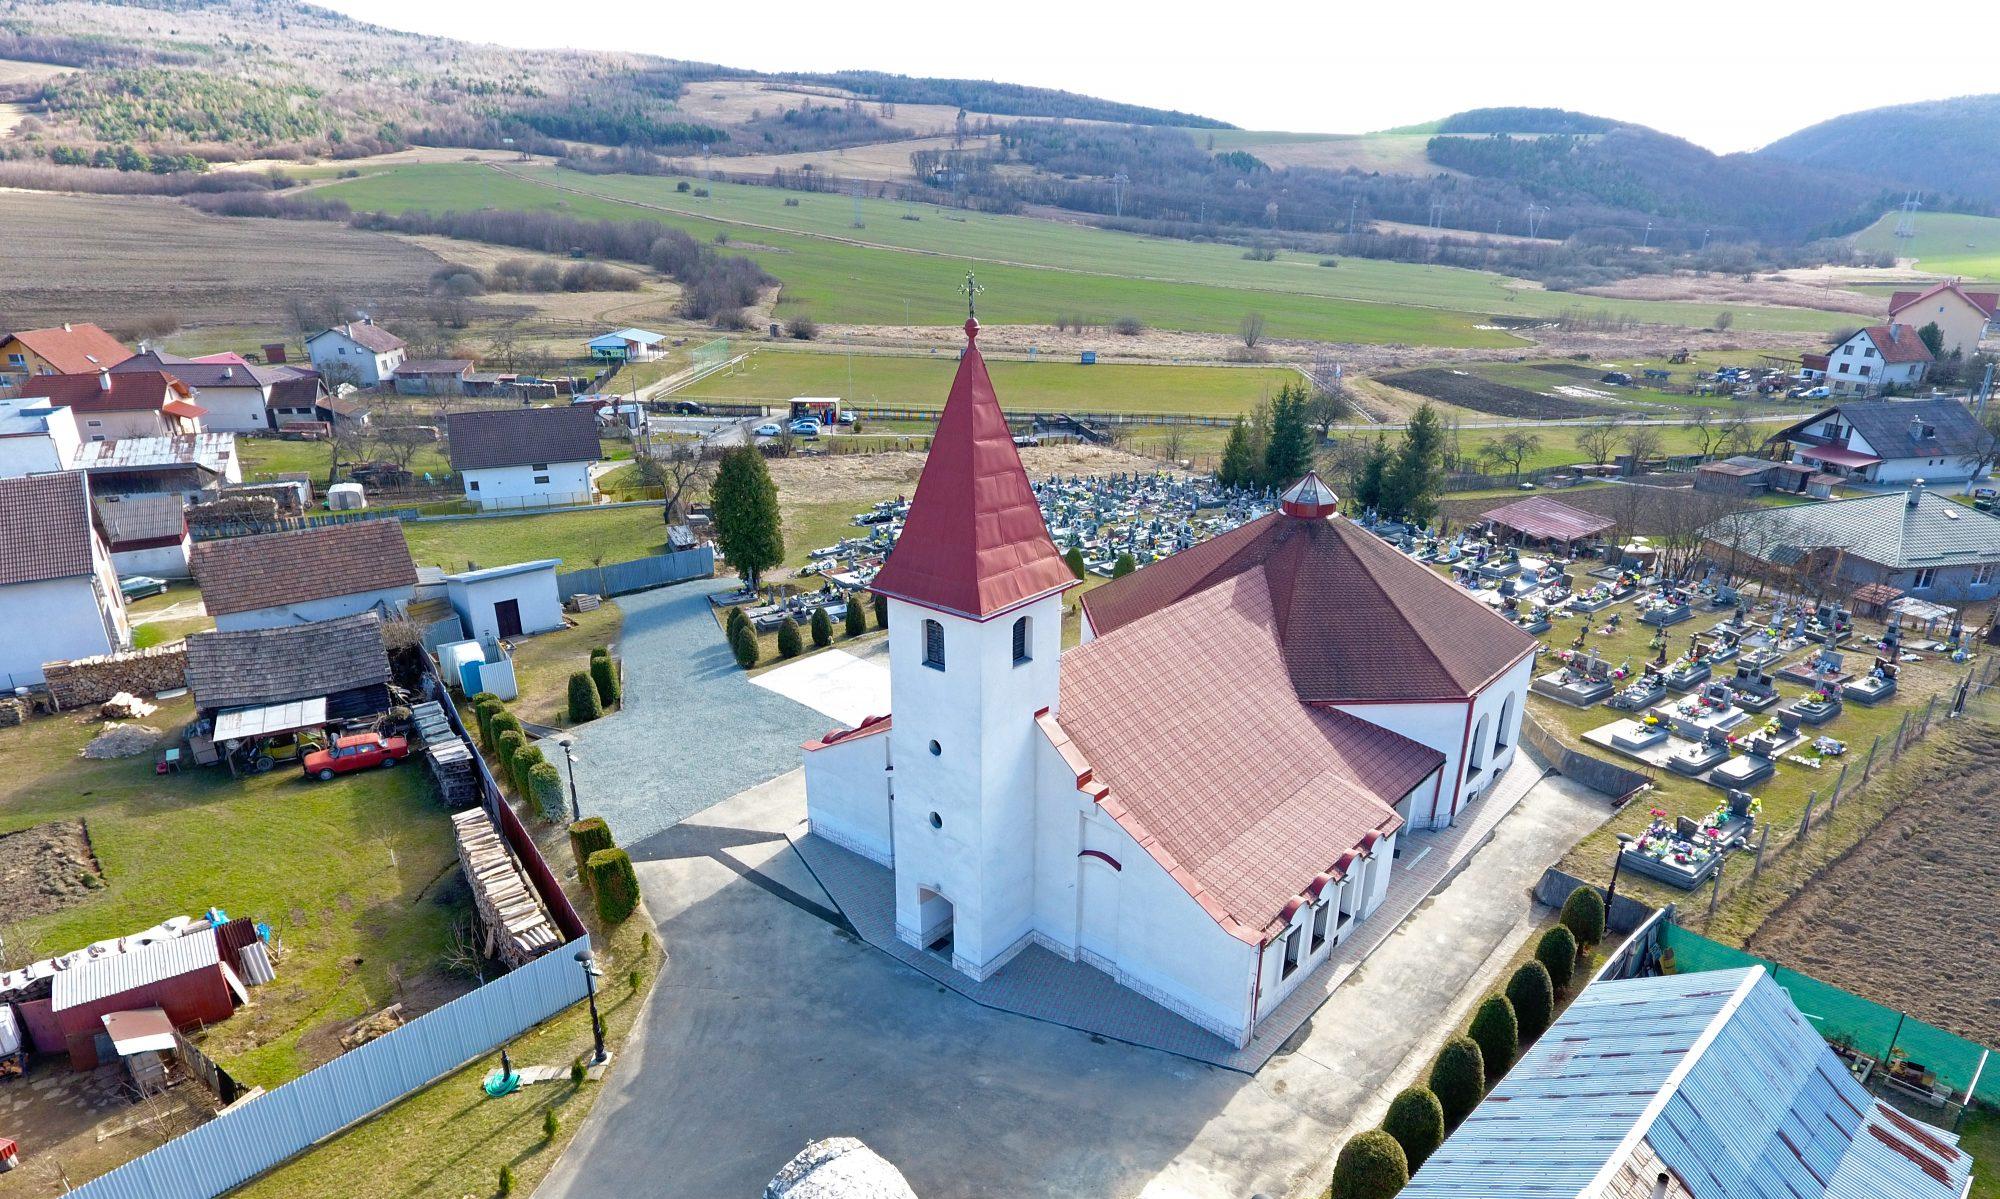 Farnosť sv. Jozefa, Víťaz